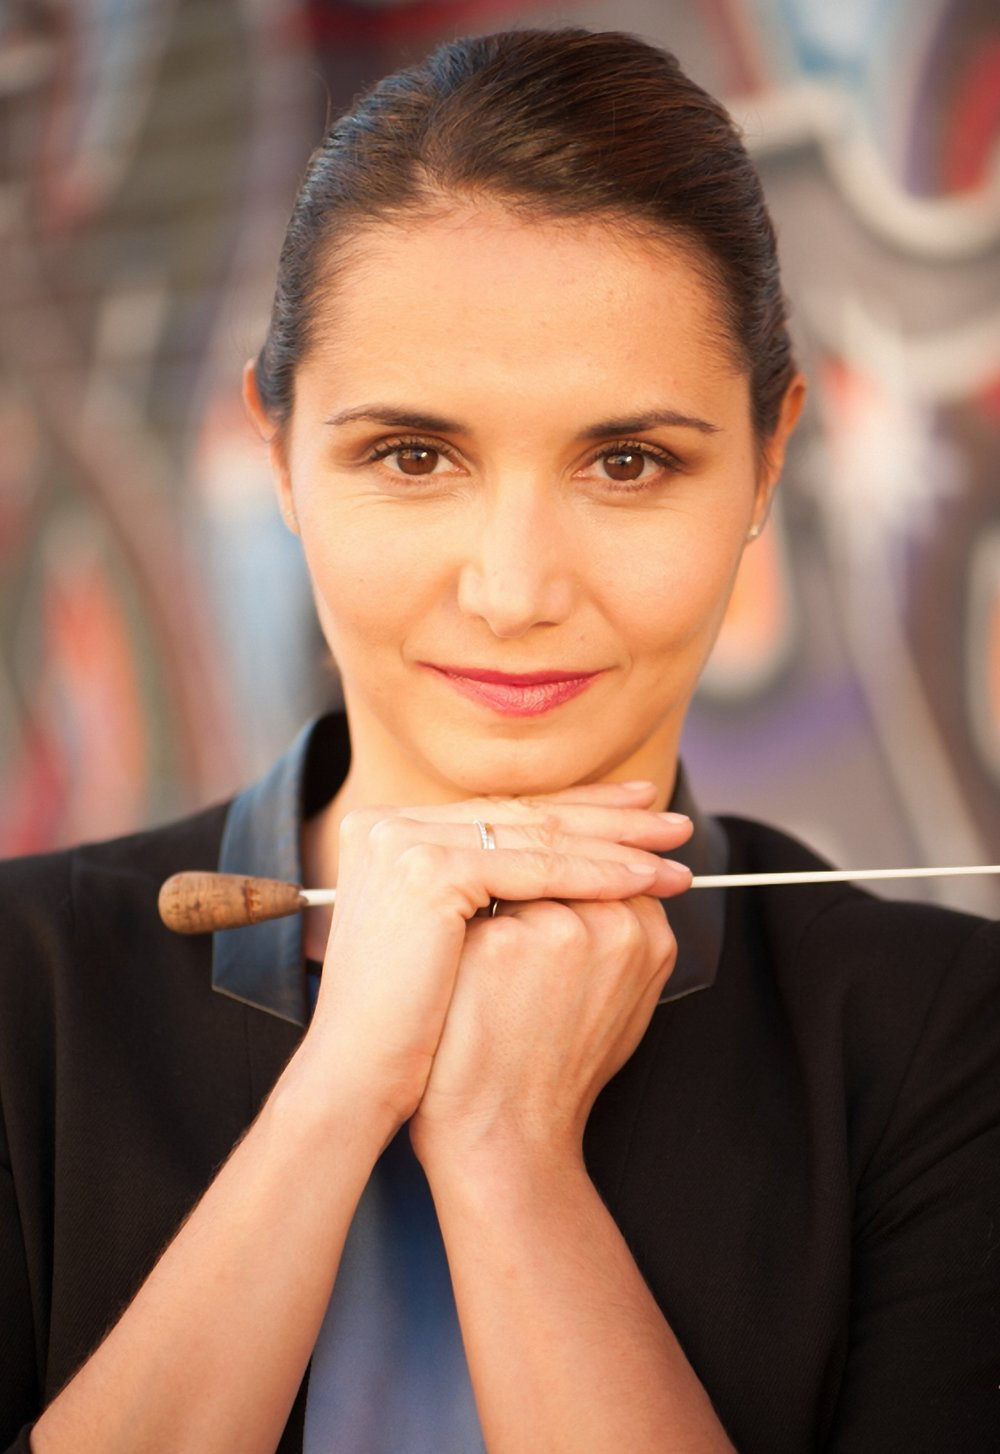 Julie Desbordes, conductor